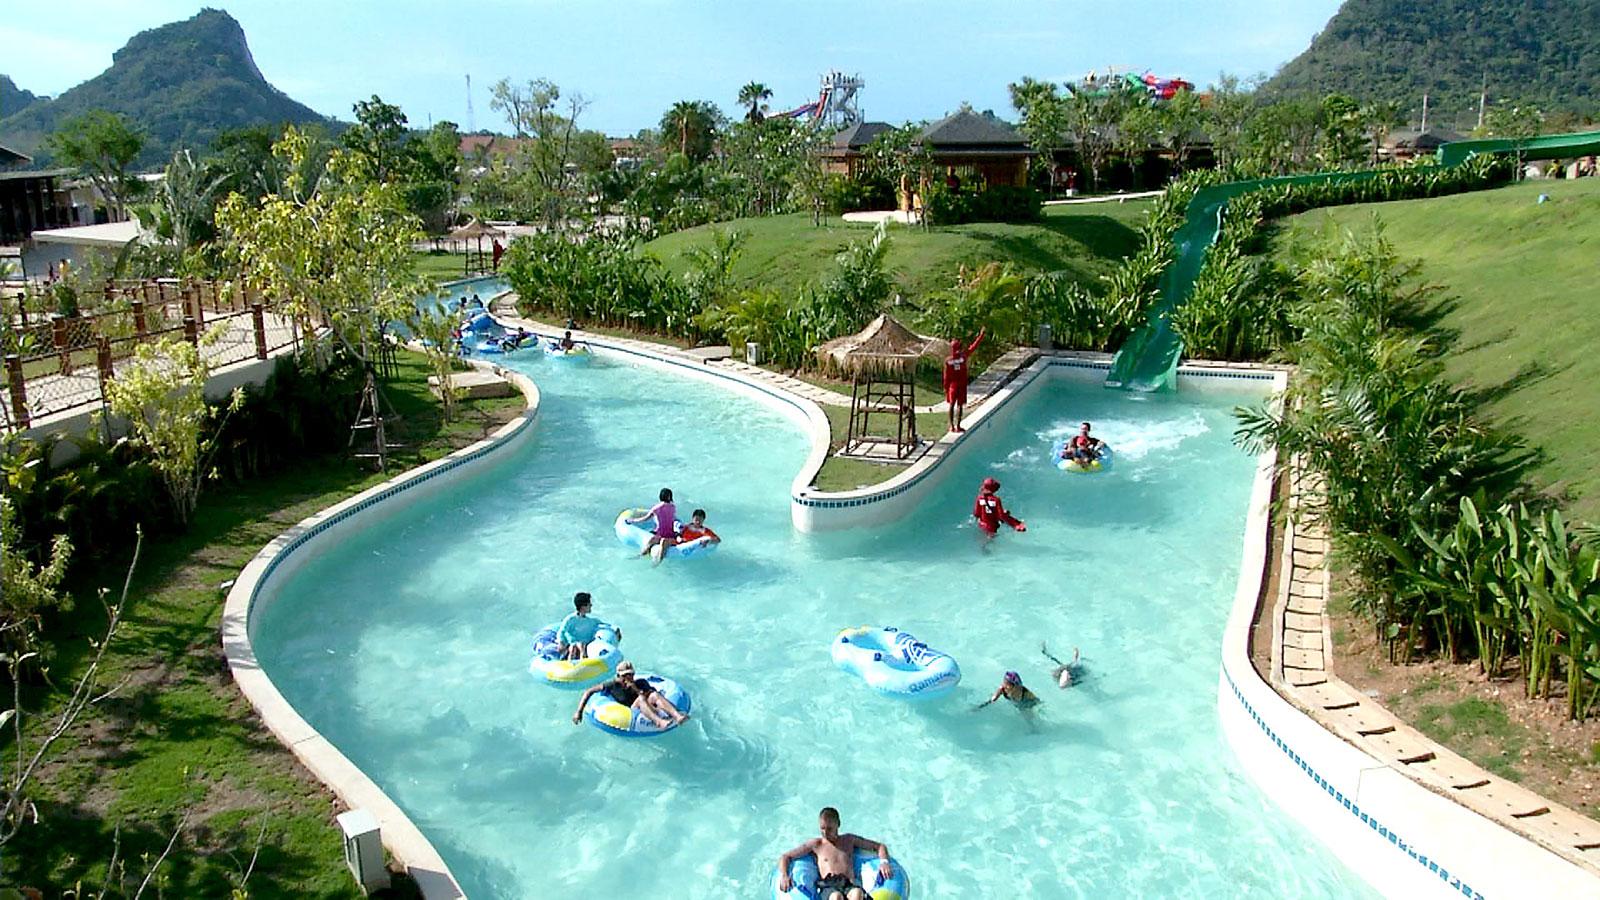 Some Water Related Activities On Halt in Pattaya